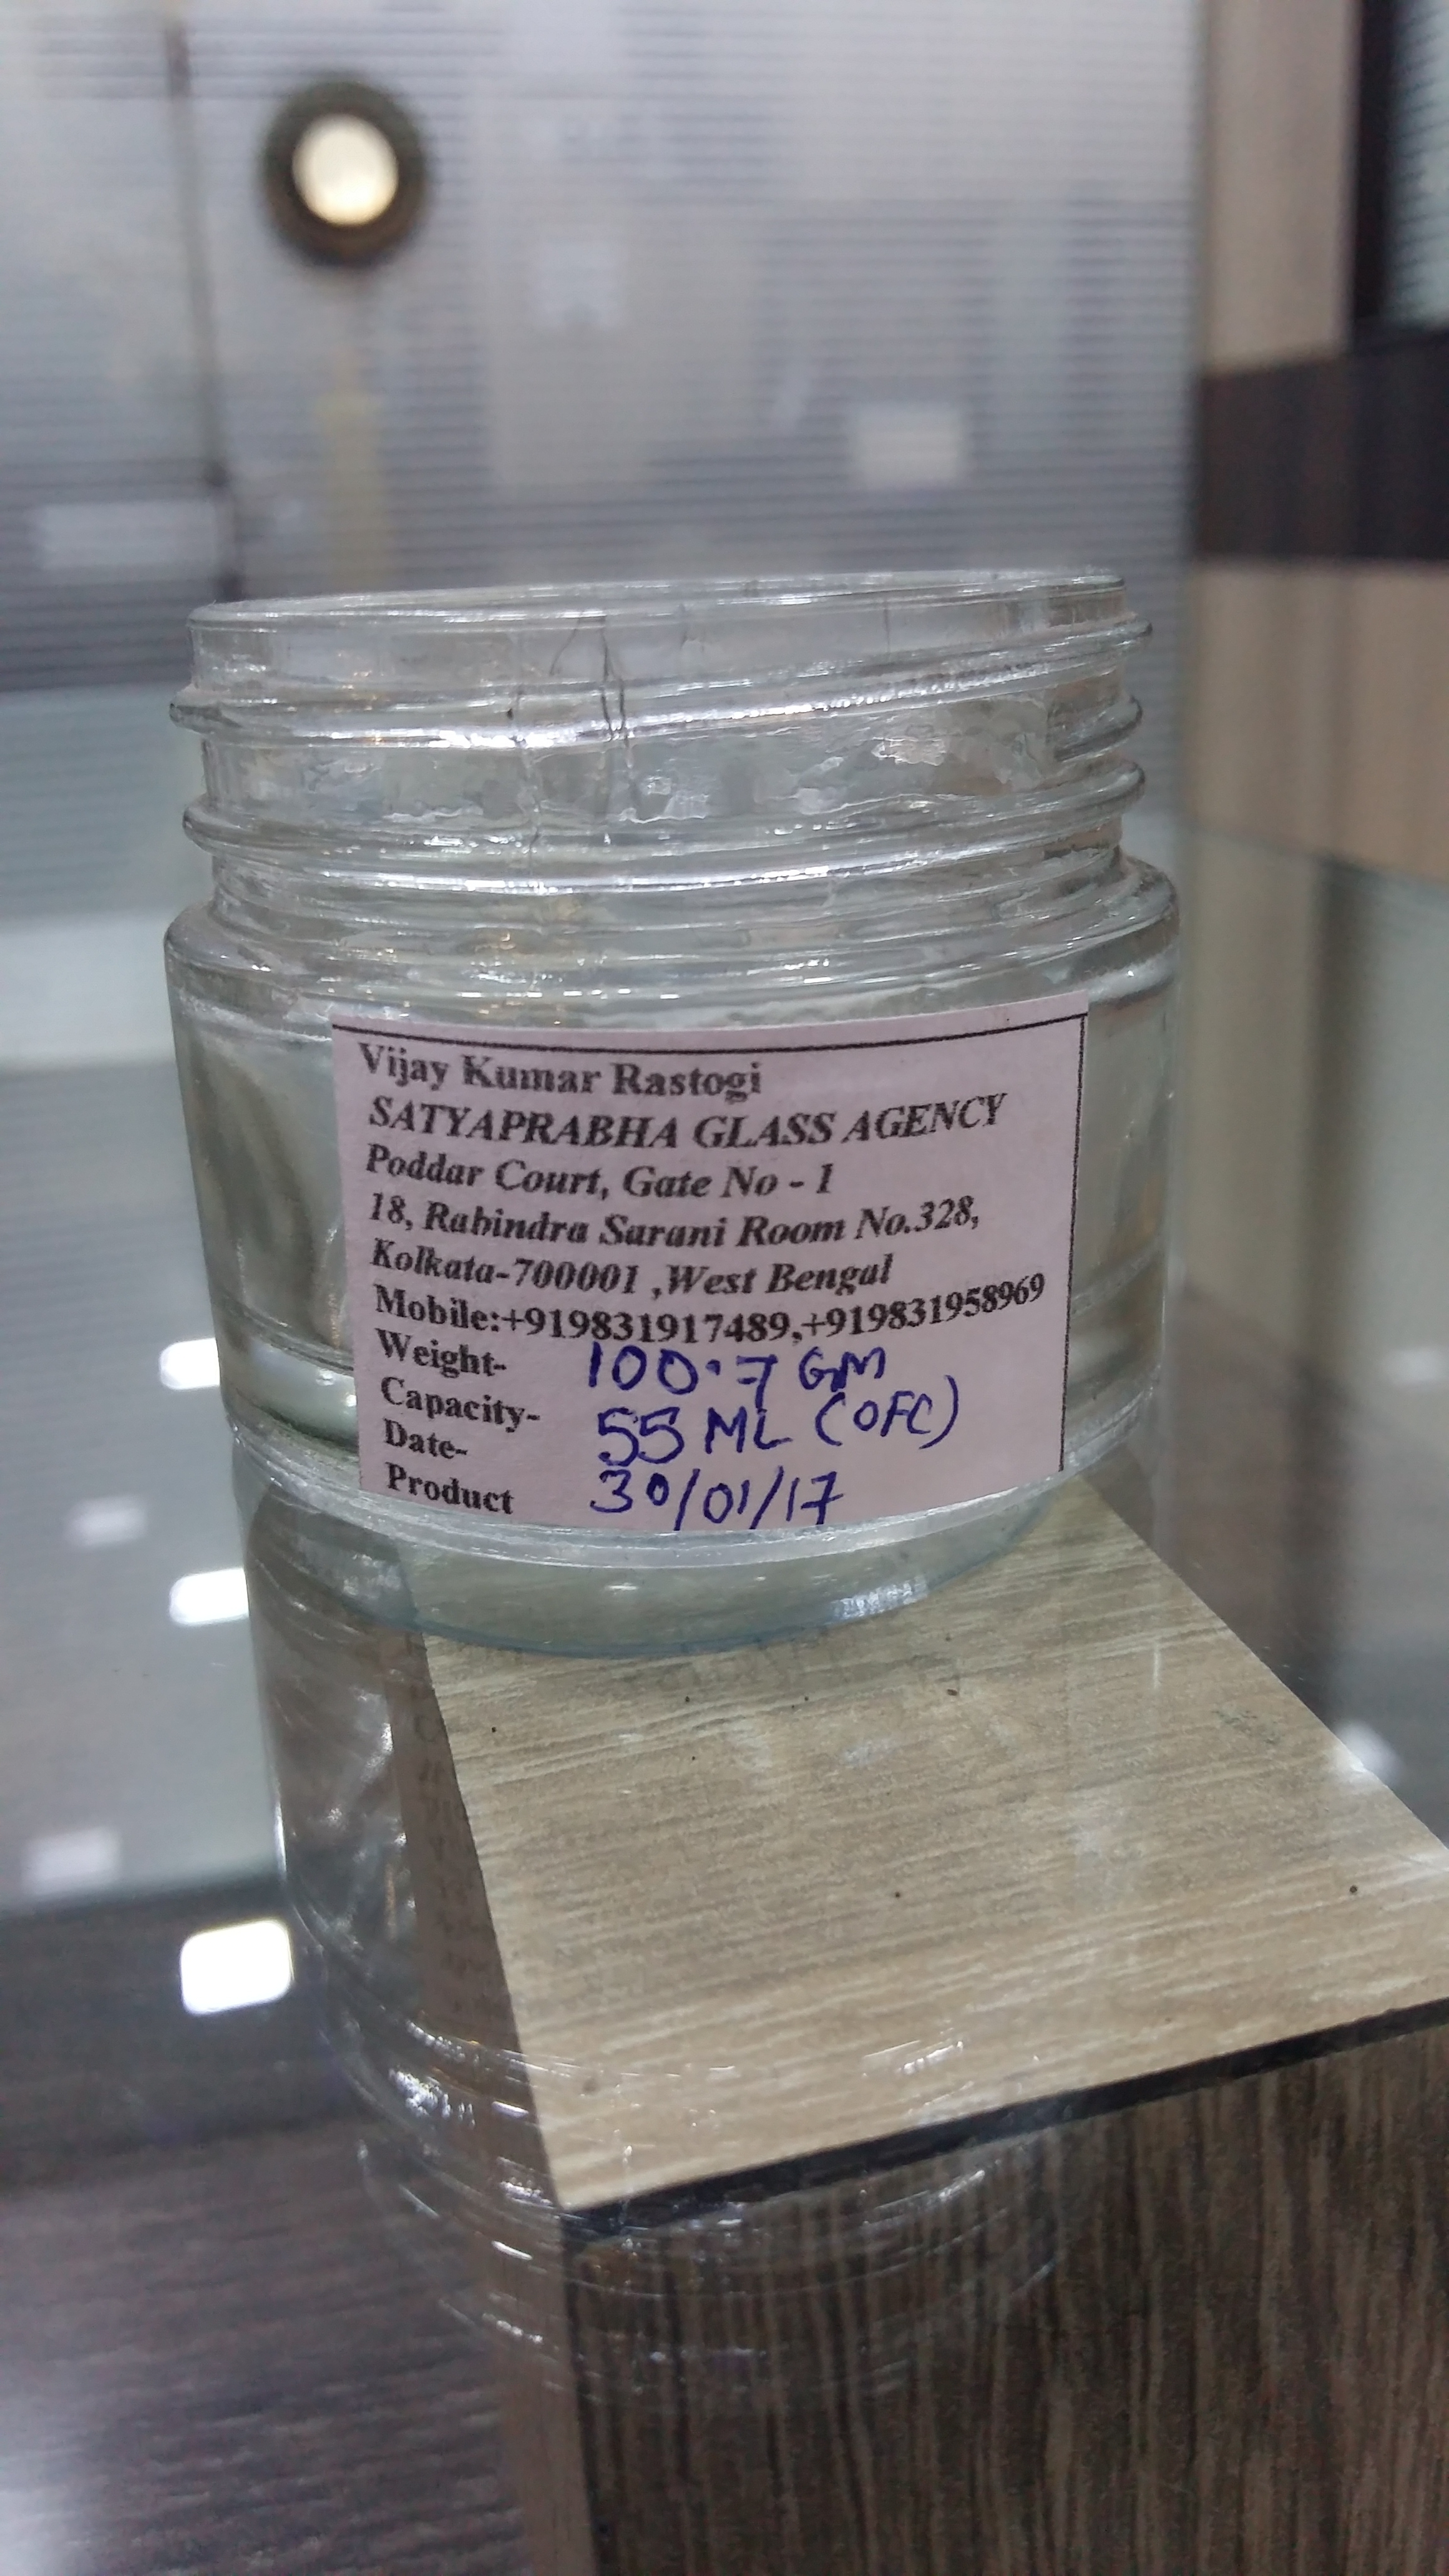 50 gm Cream Jar